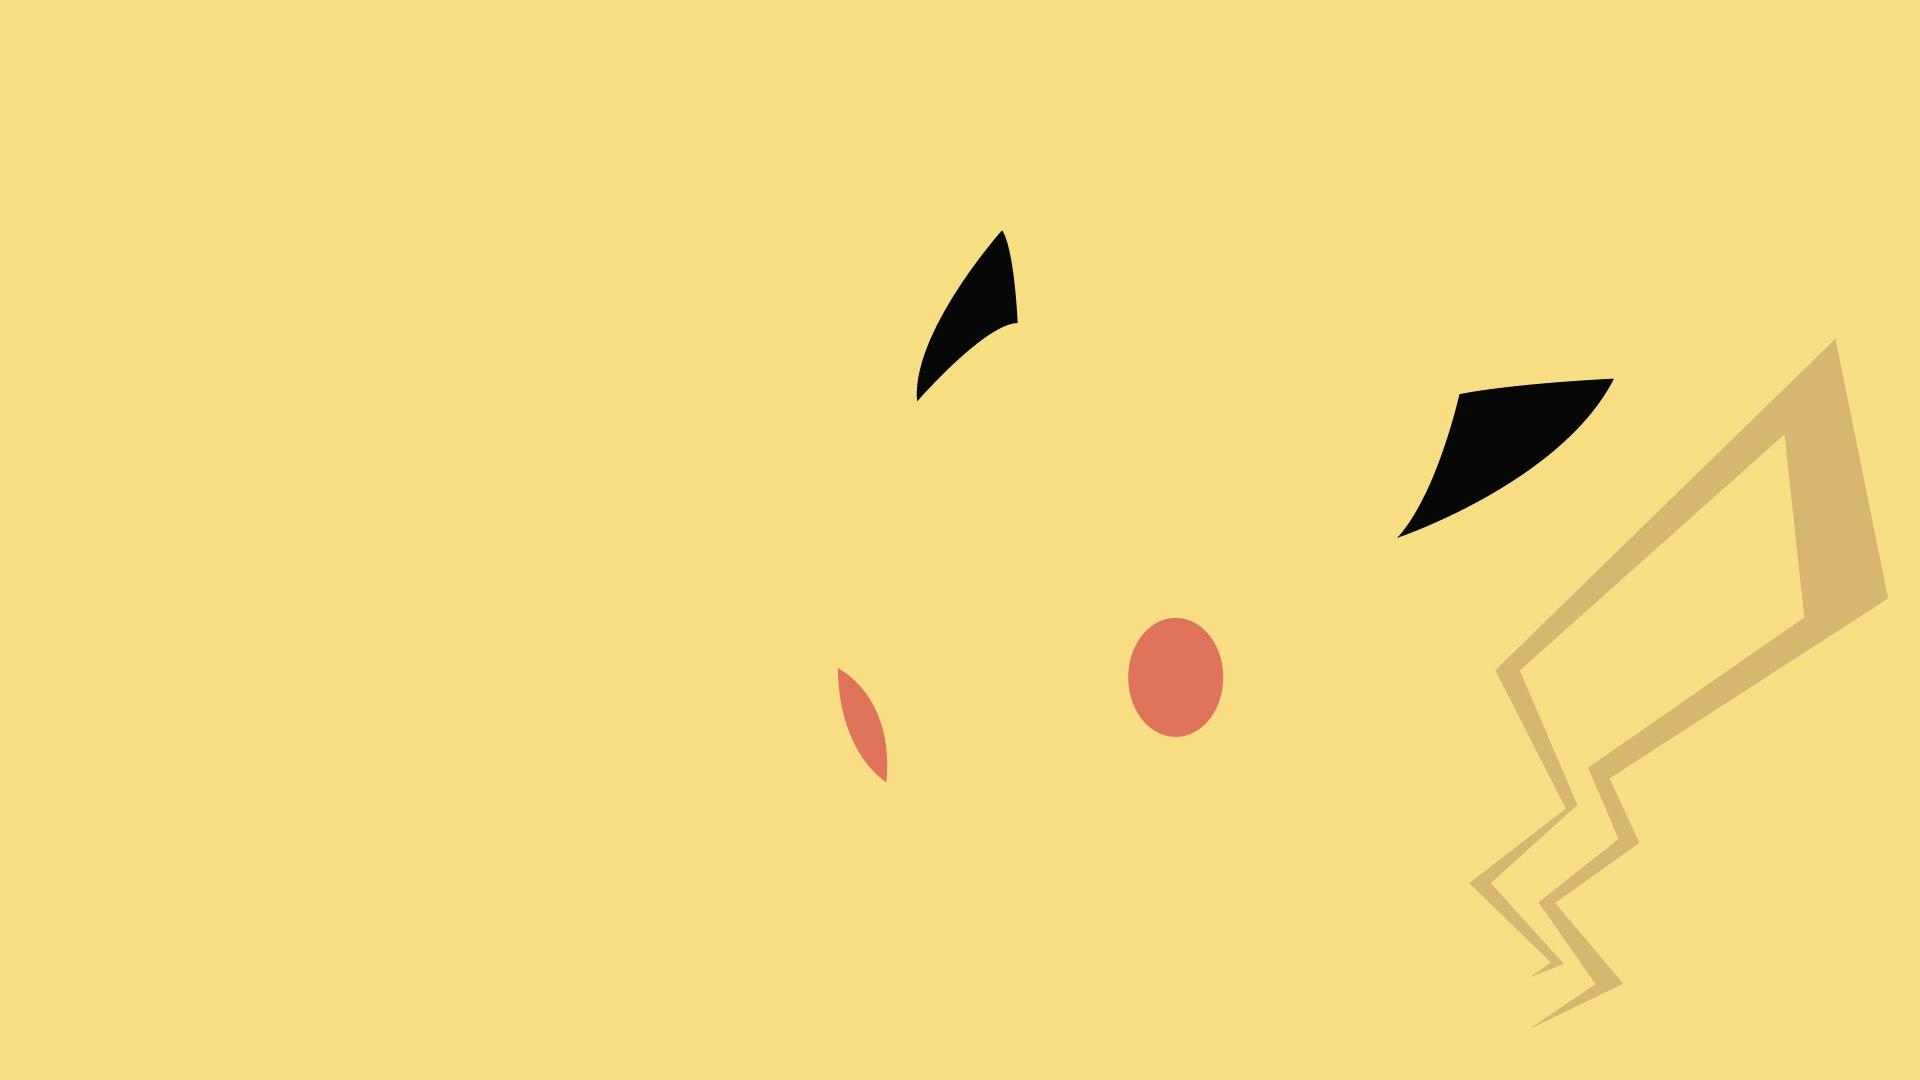 Abstract Pokemon Pikachu Wallpaper 1920x1080